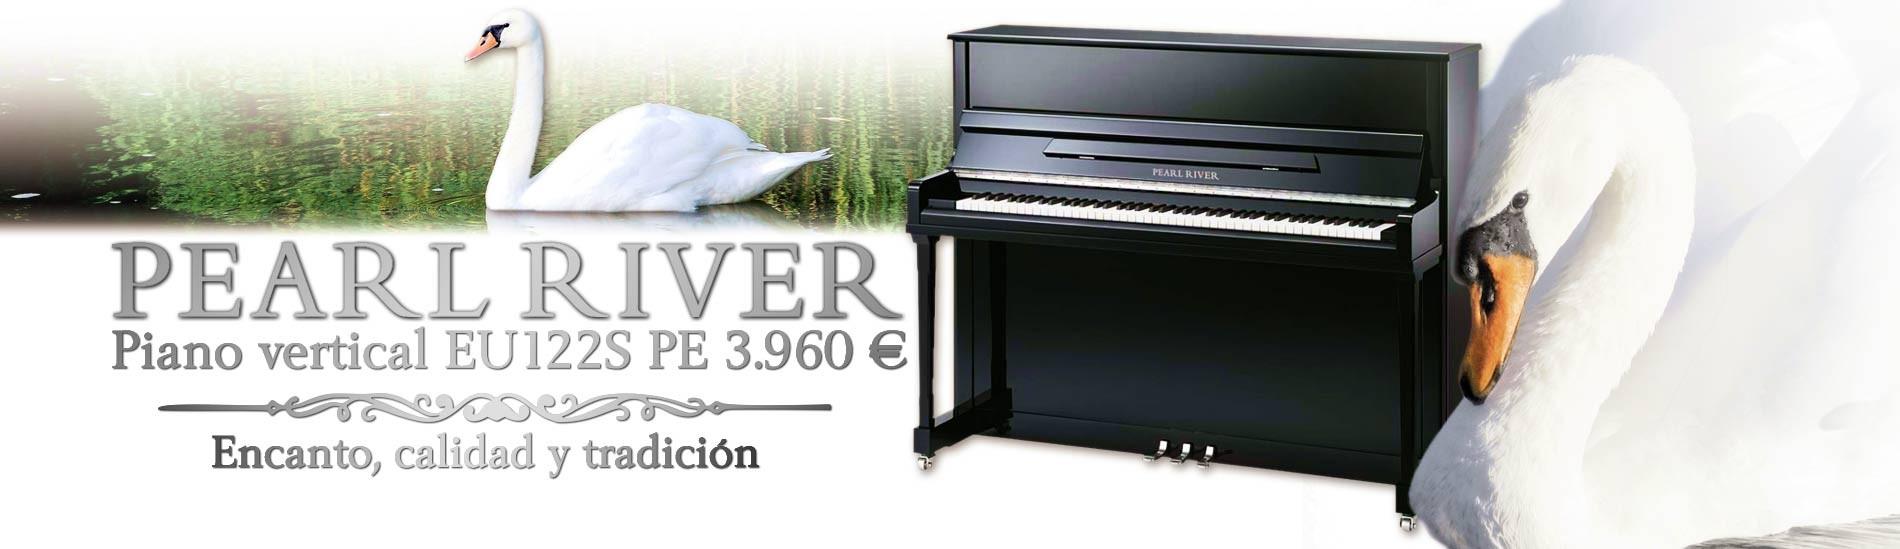 Piano Vertical Pearl River EU122S PE Negro Pulido Premium Profesional